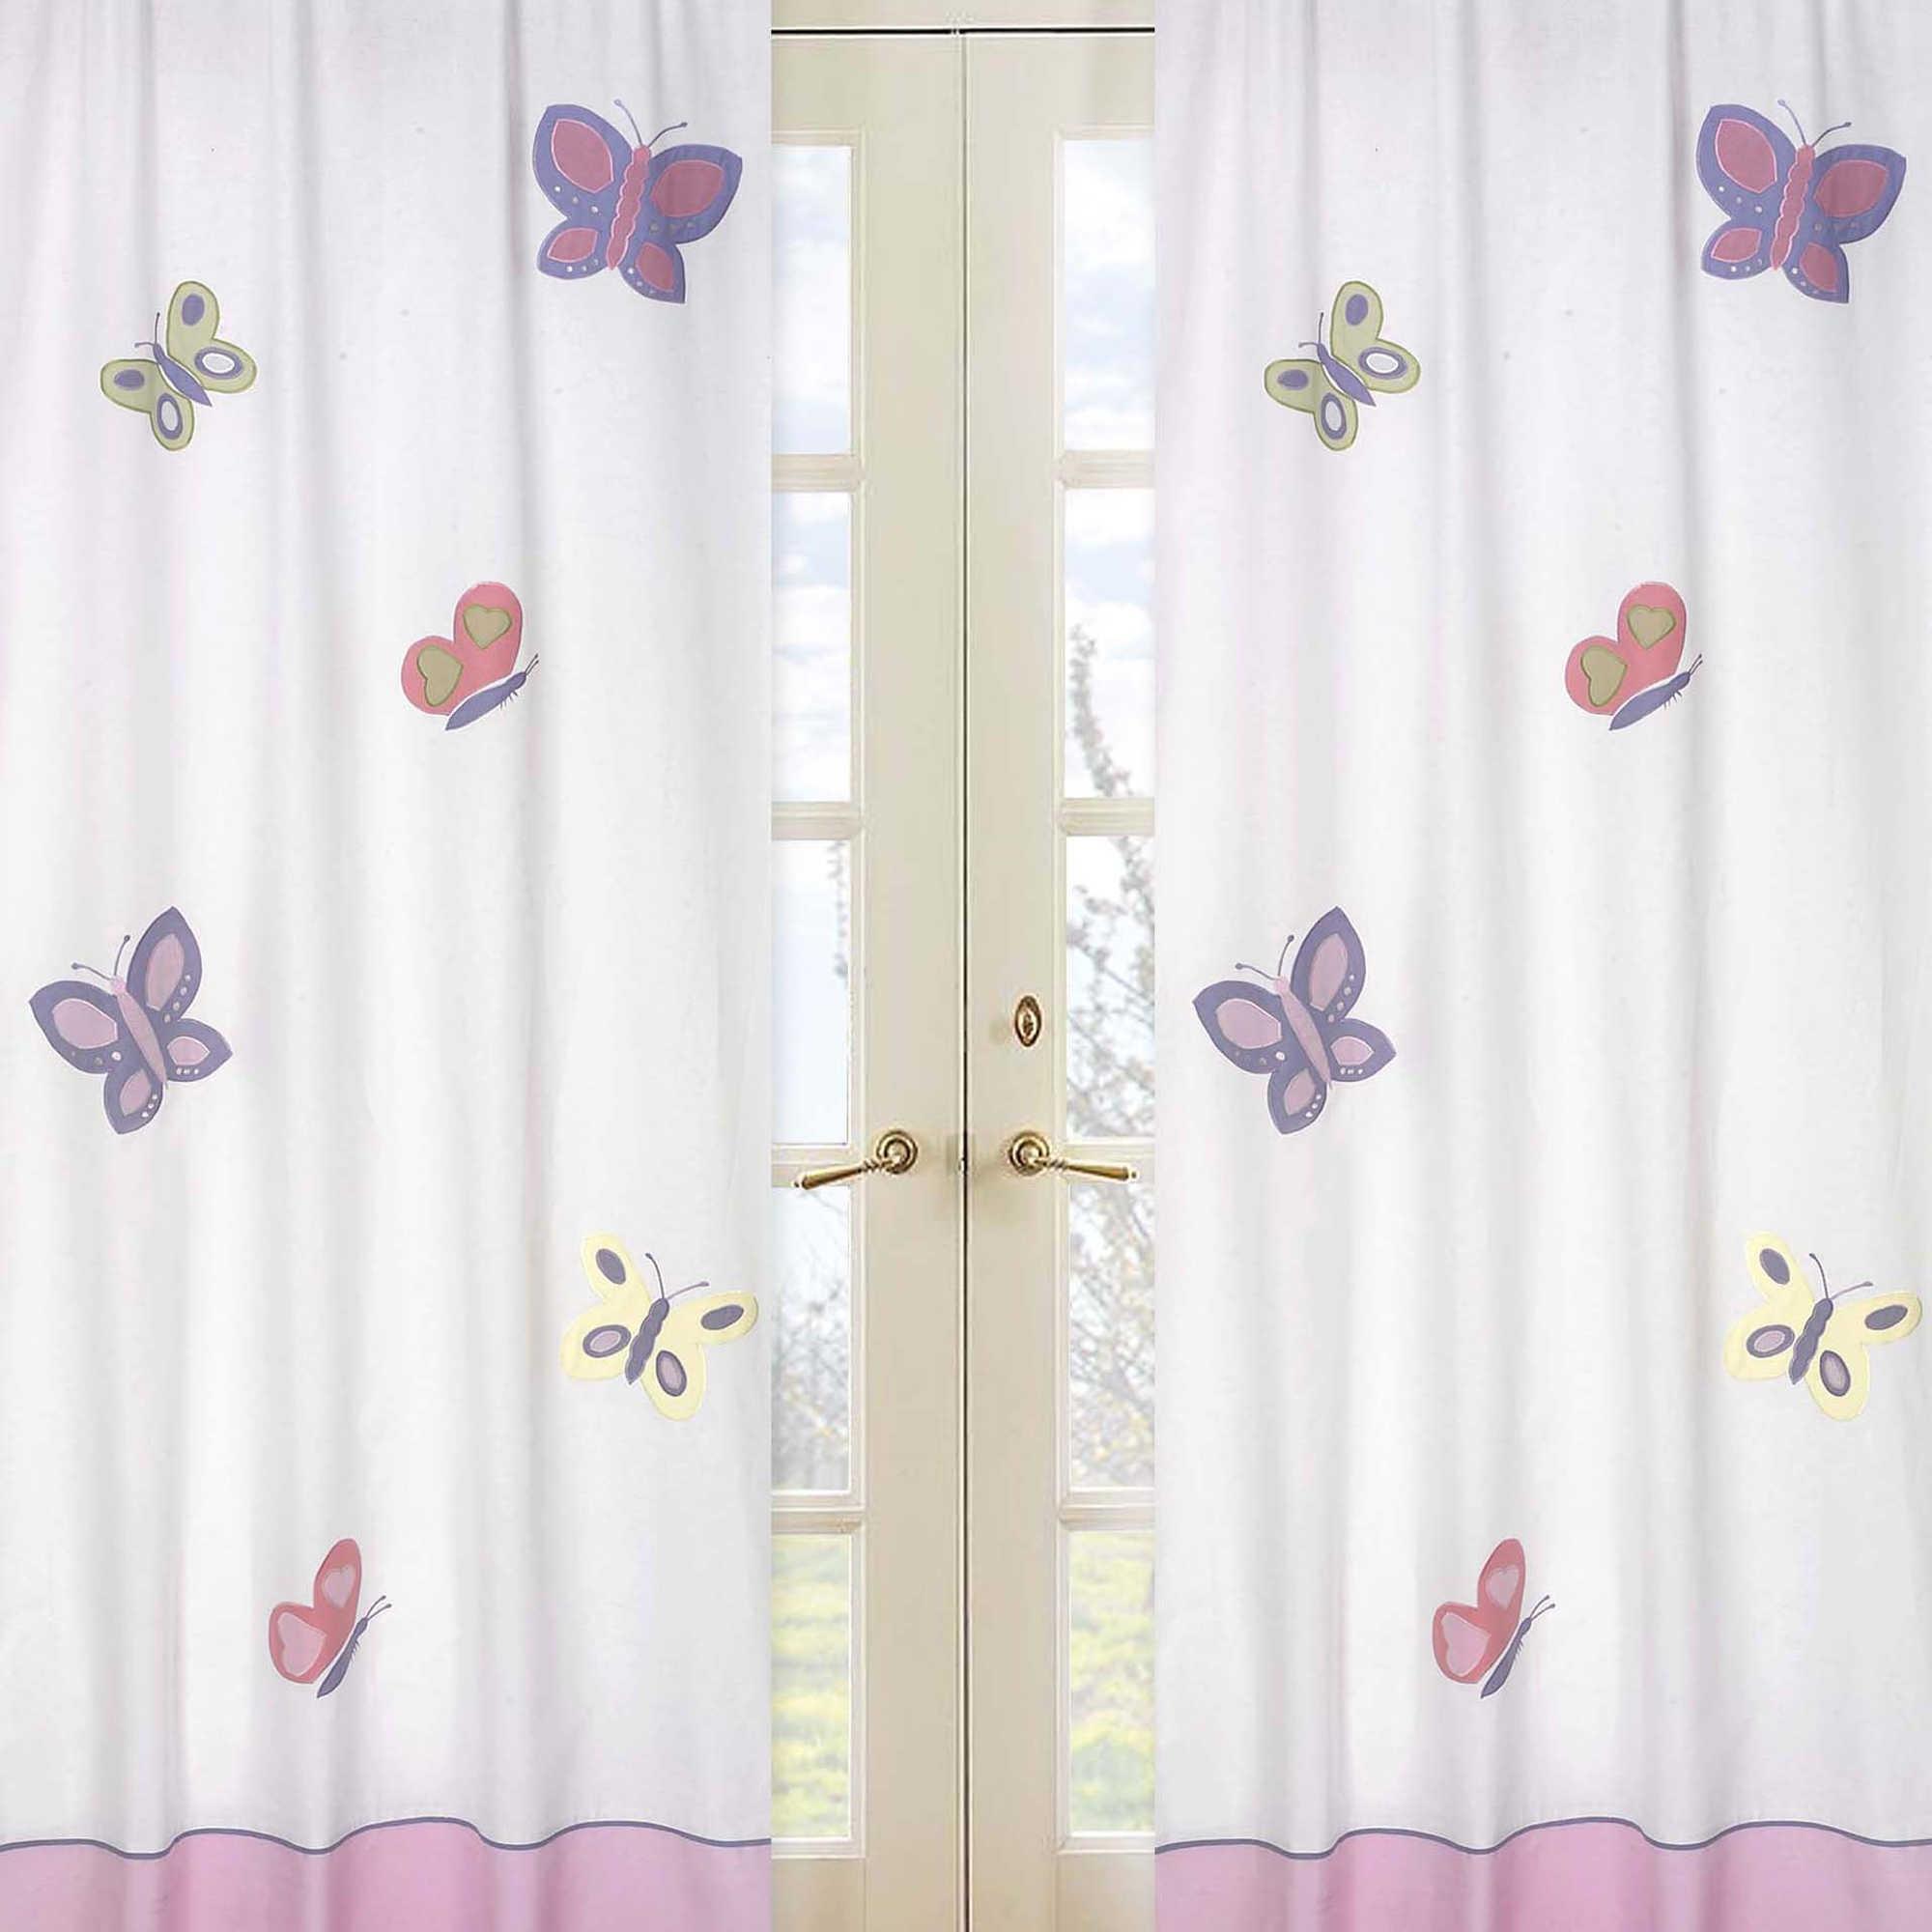 Purple Curtains For Kids Room  25 Best Ideas Purple Curtains for Kids Room